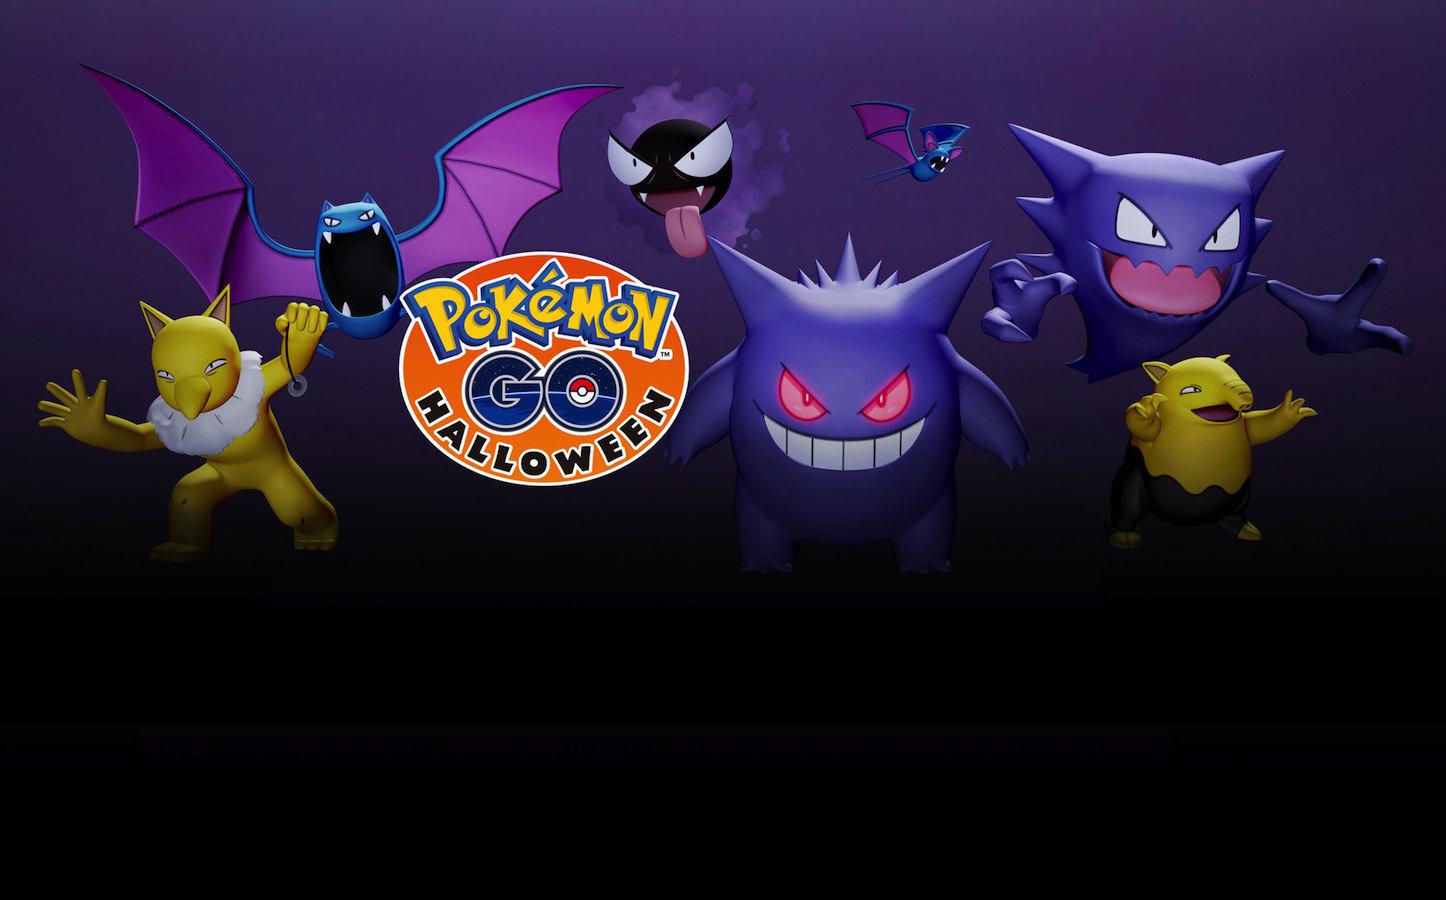 Pokemon go halloween campaign